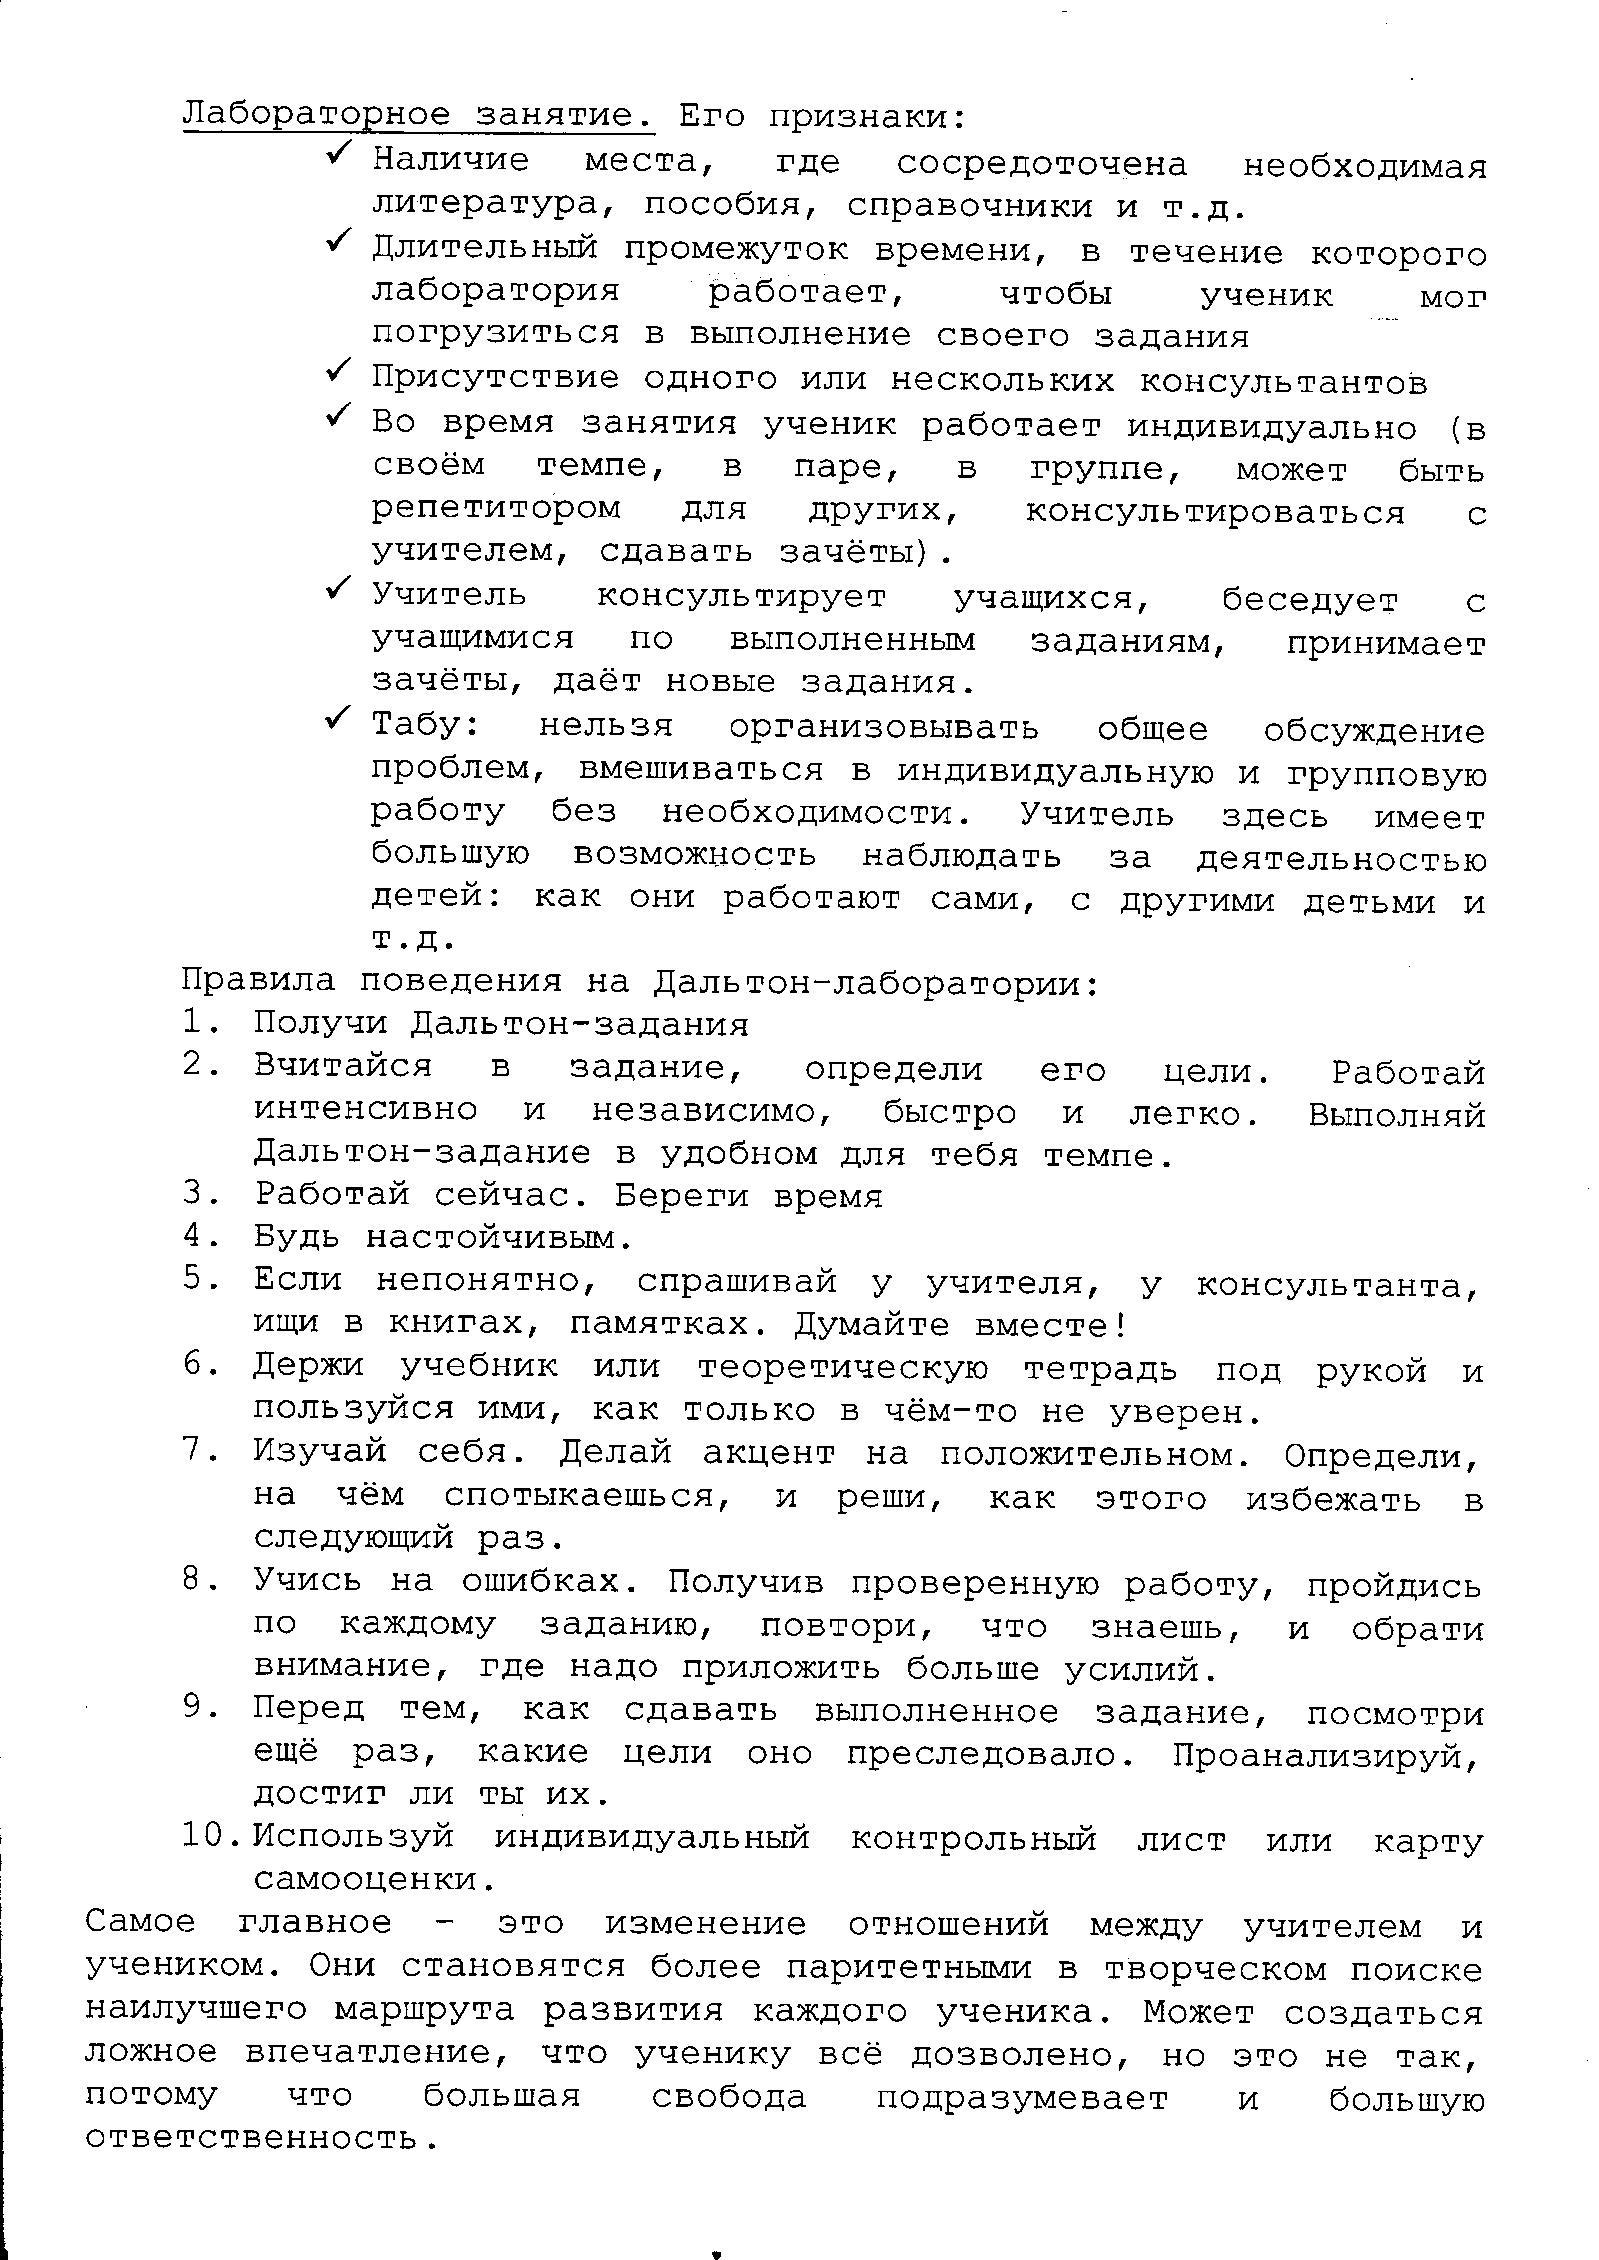 C:\Documents and Settings\Юлия\Мои документы\Мои рисунки\MP Navigator EX\2012_02_20\IMG_0013.tif